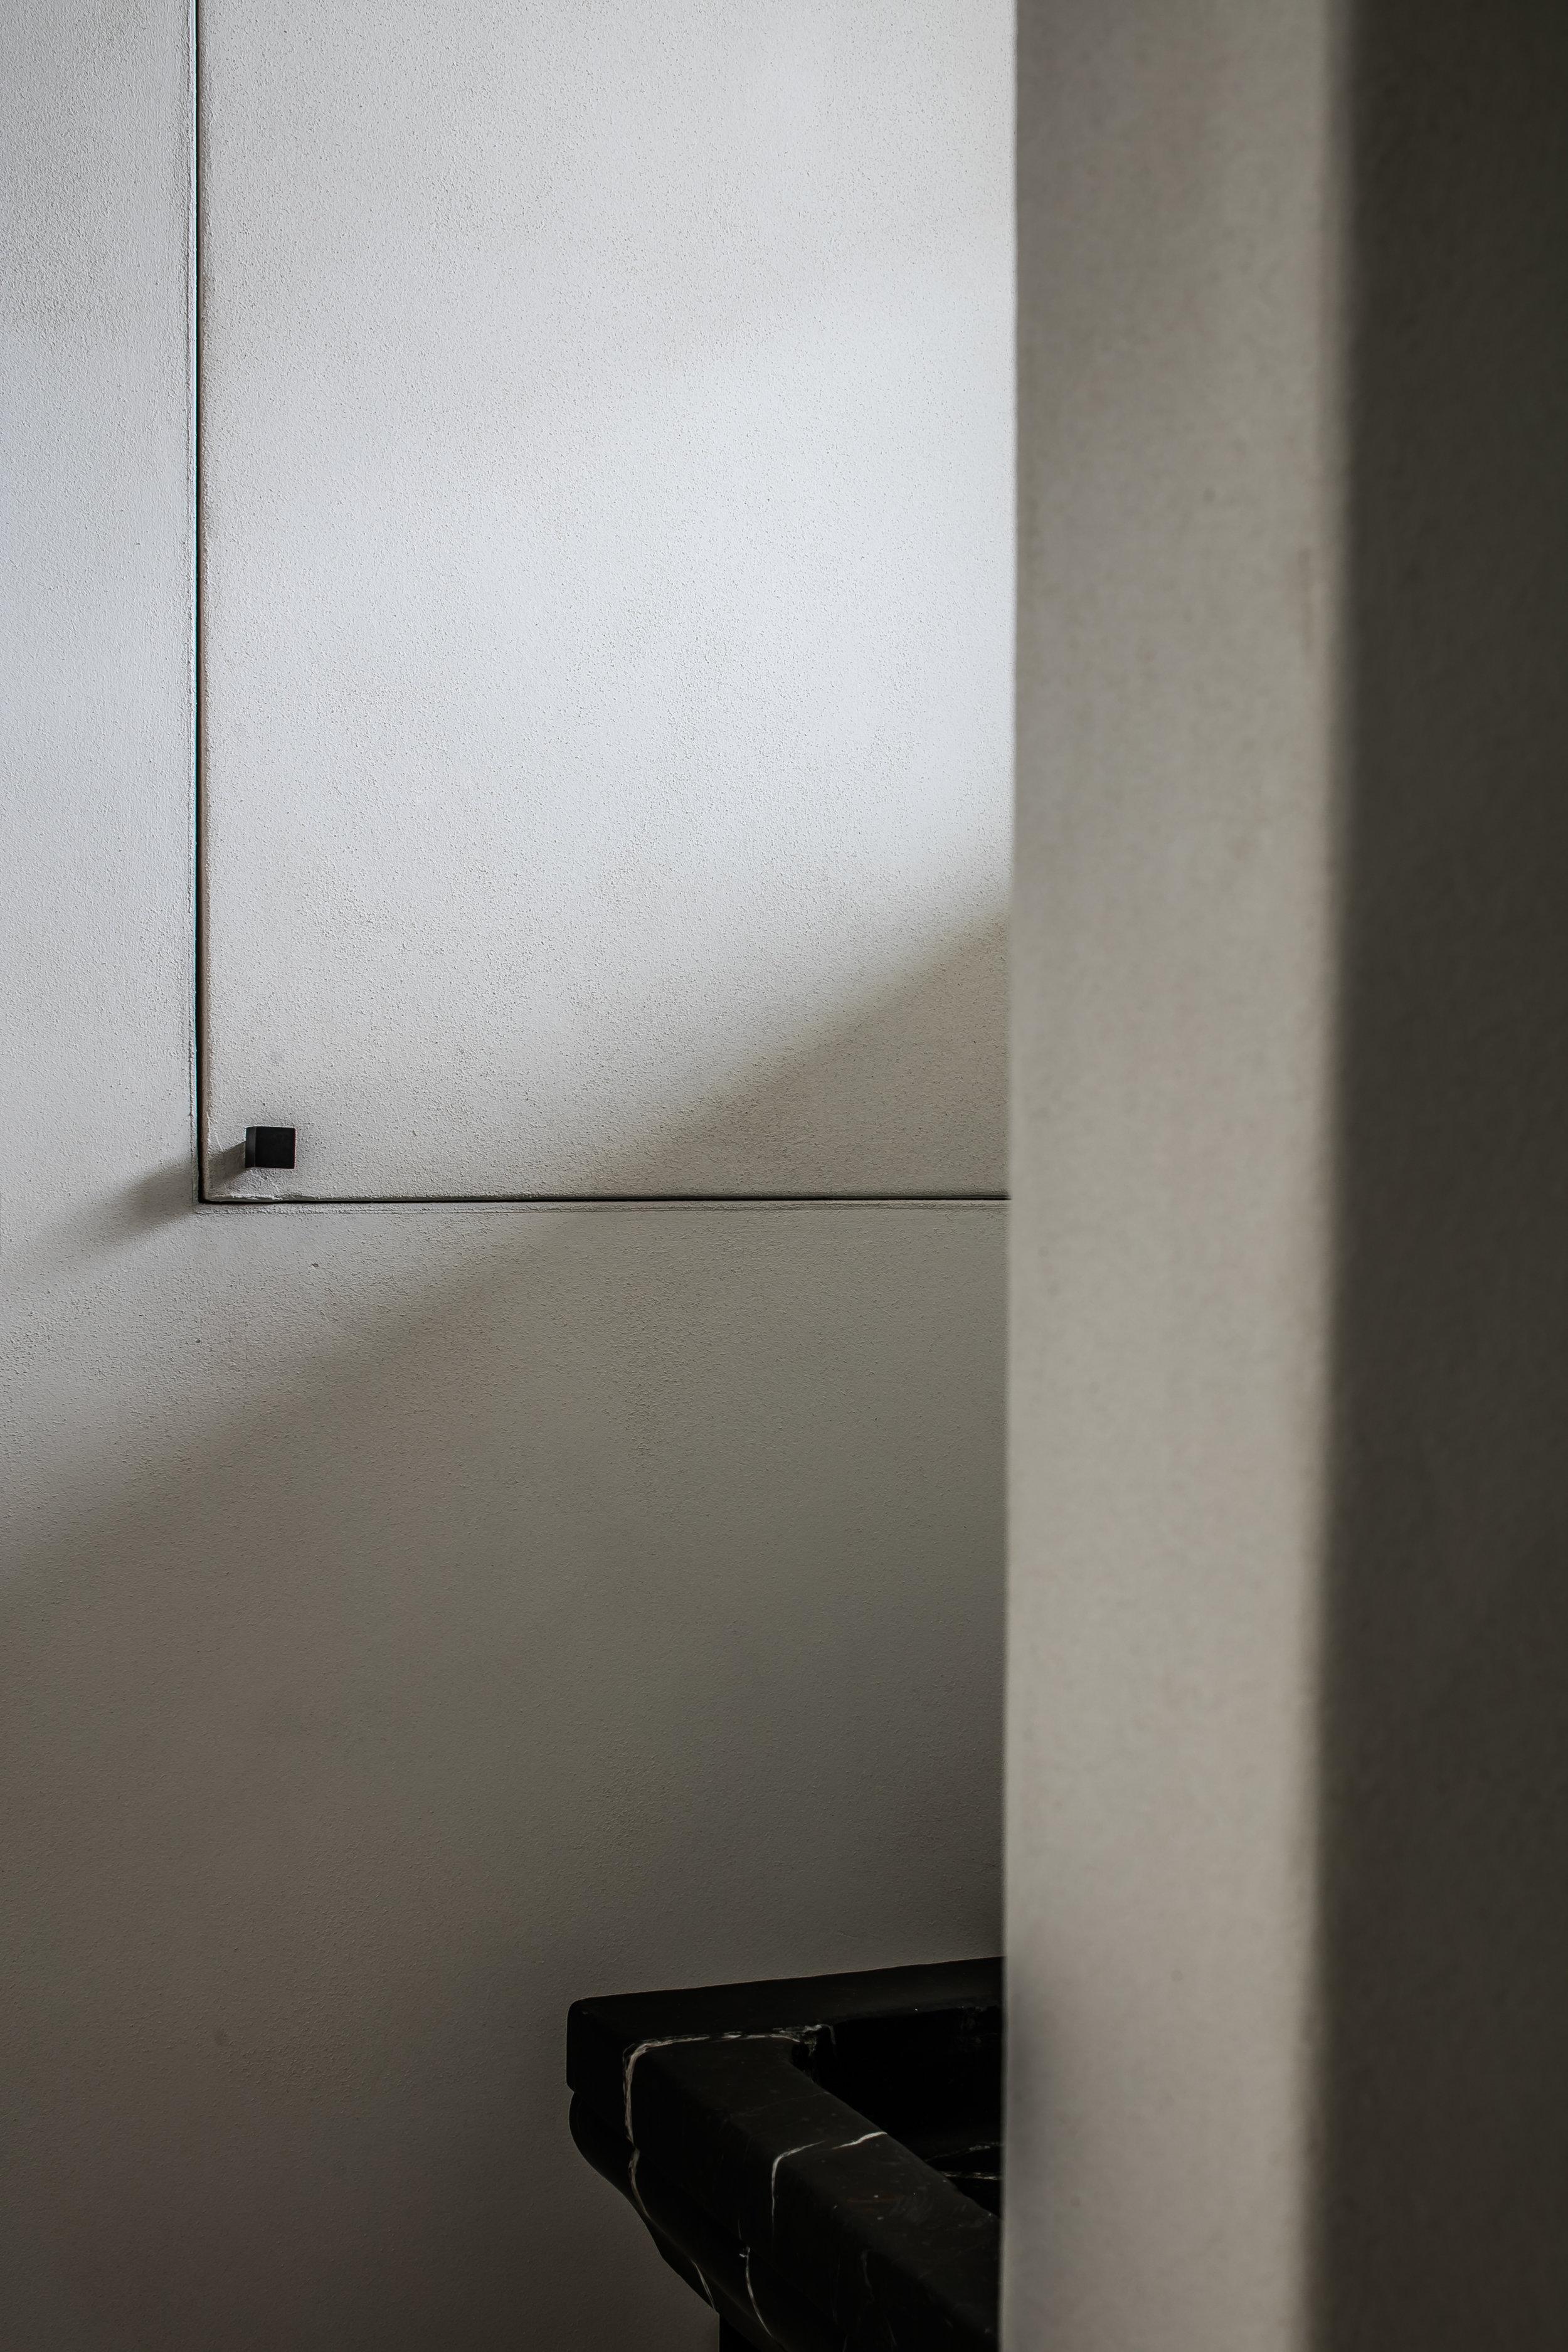 aardiggedacht-photo-cafeine-be-2154.jpg